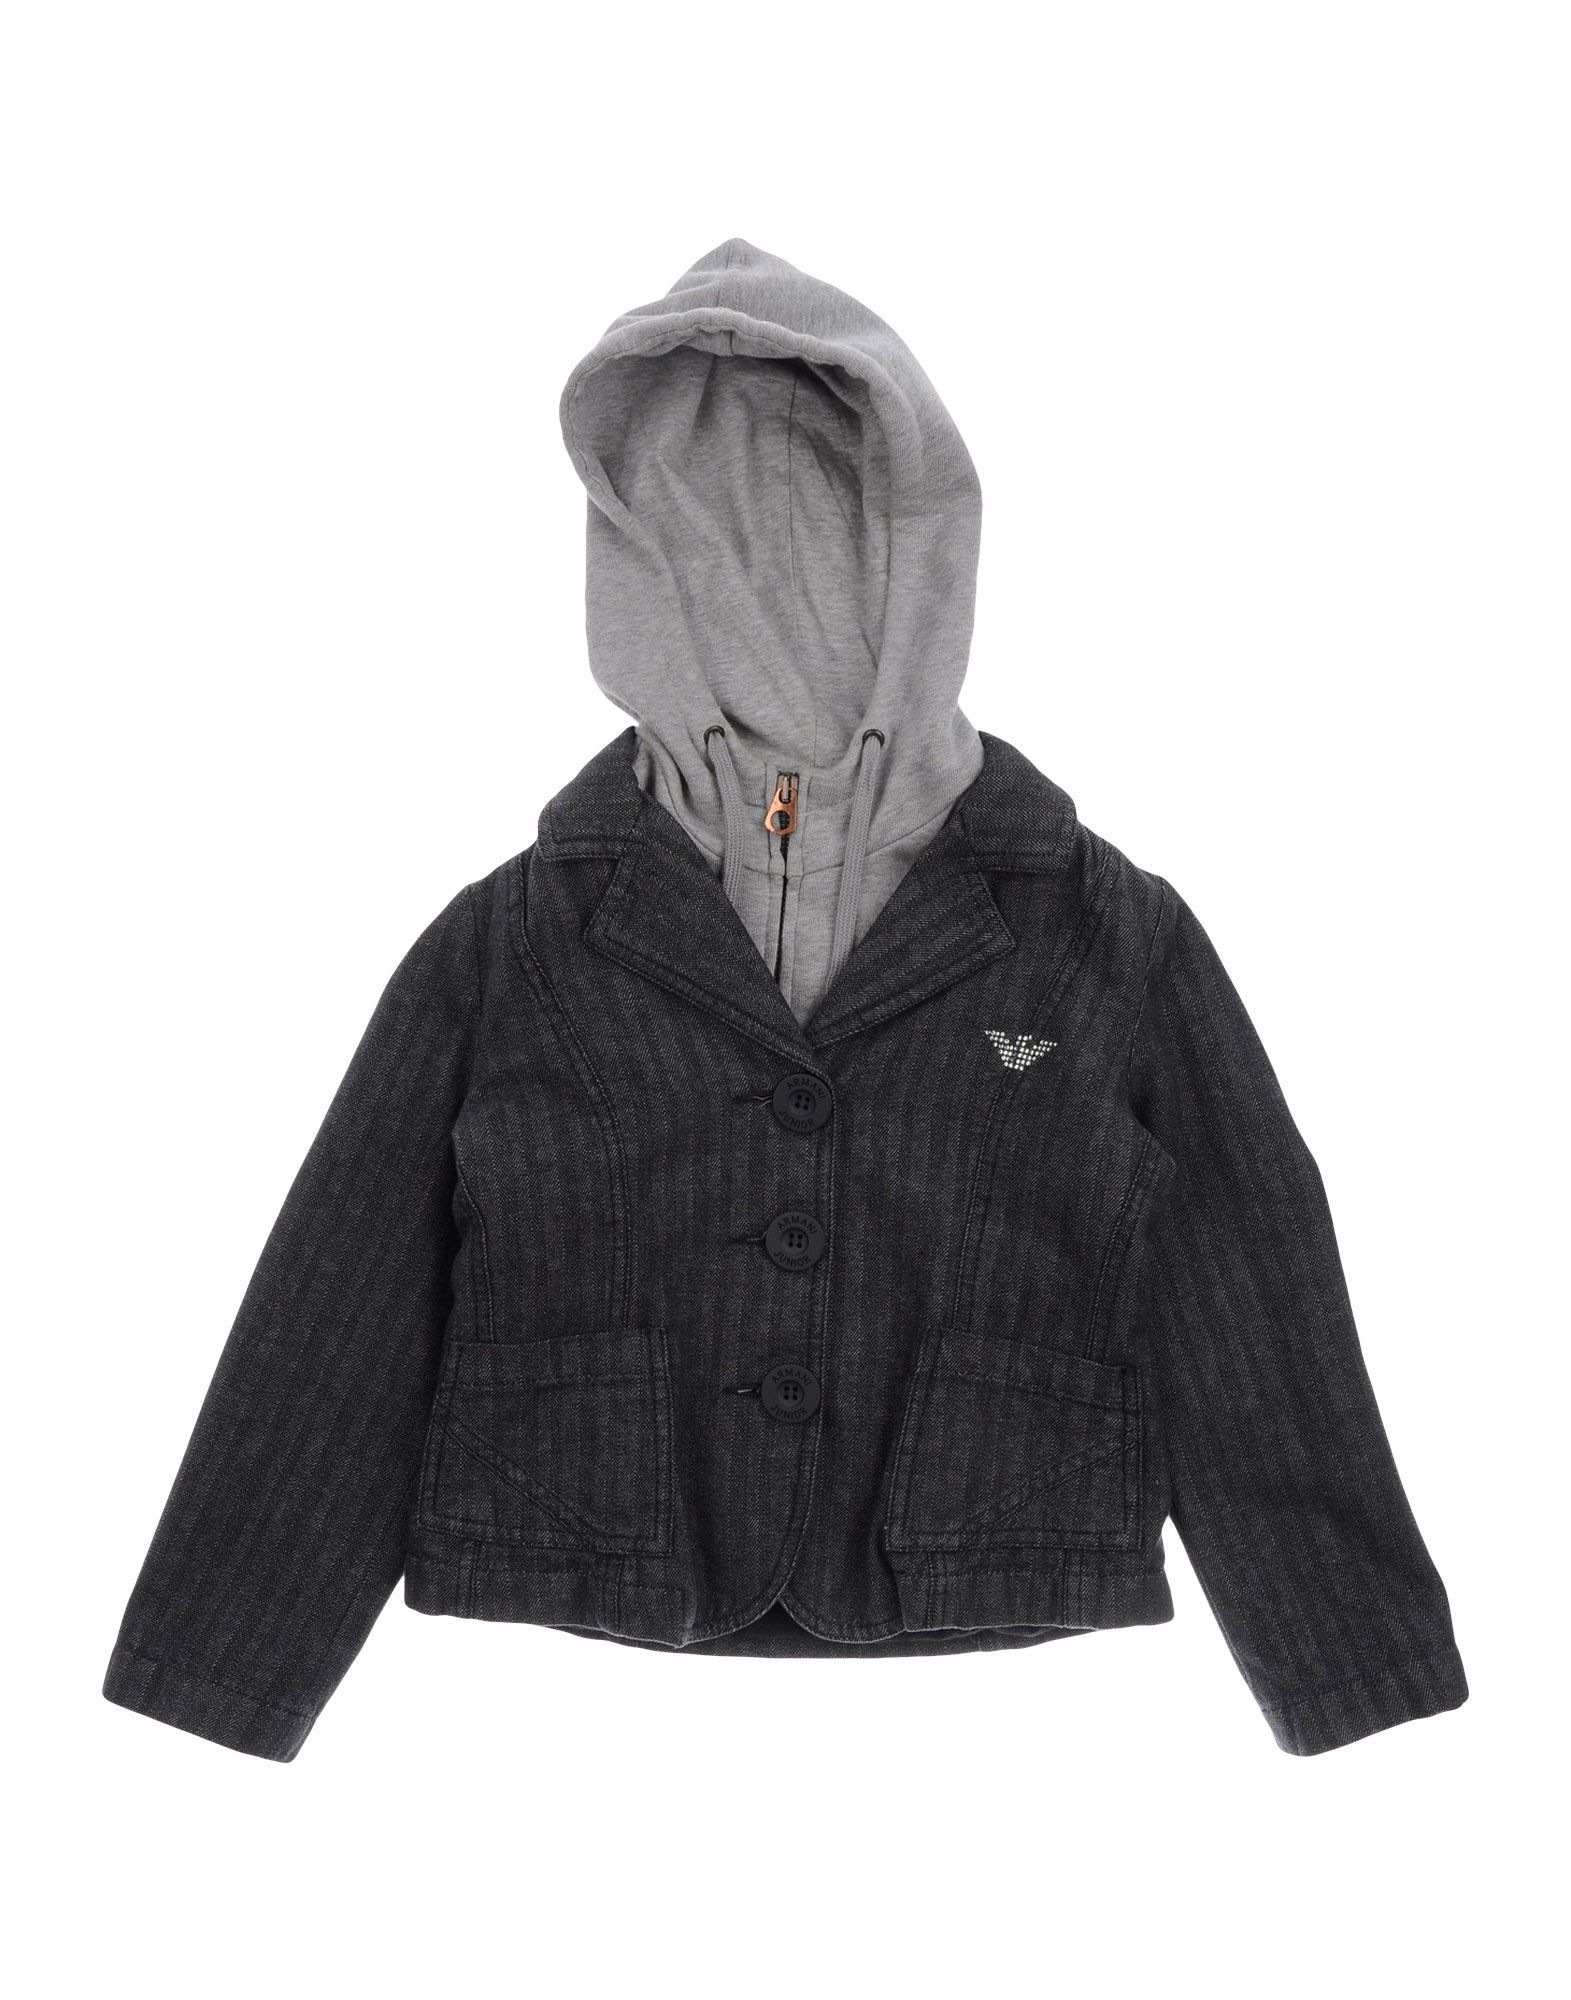 SUITS AND JACKETS Armani Junior Steel grey Boy Cotton